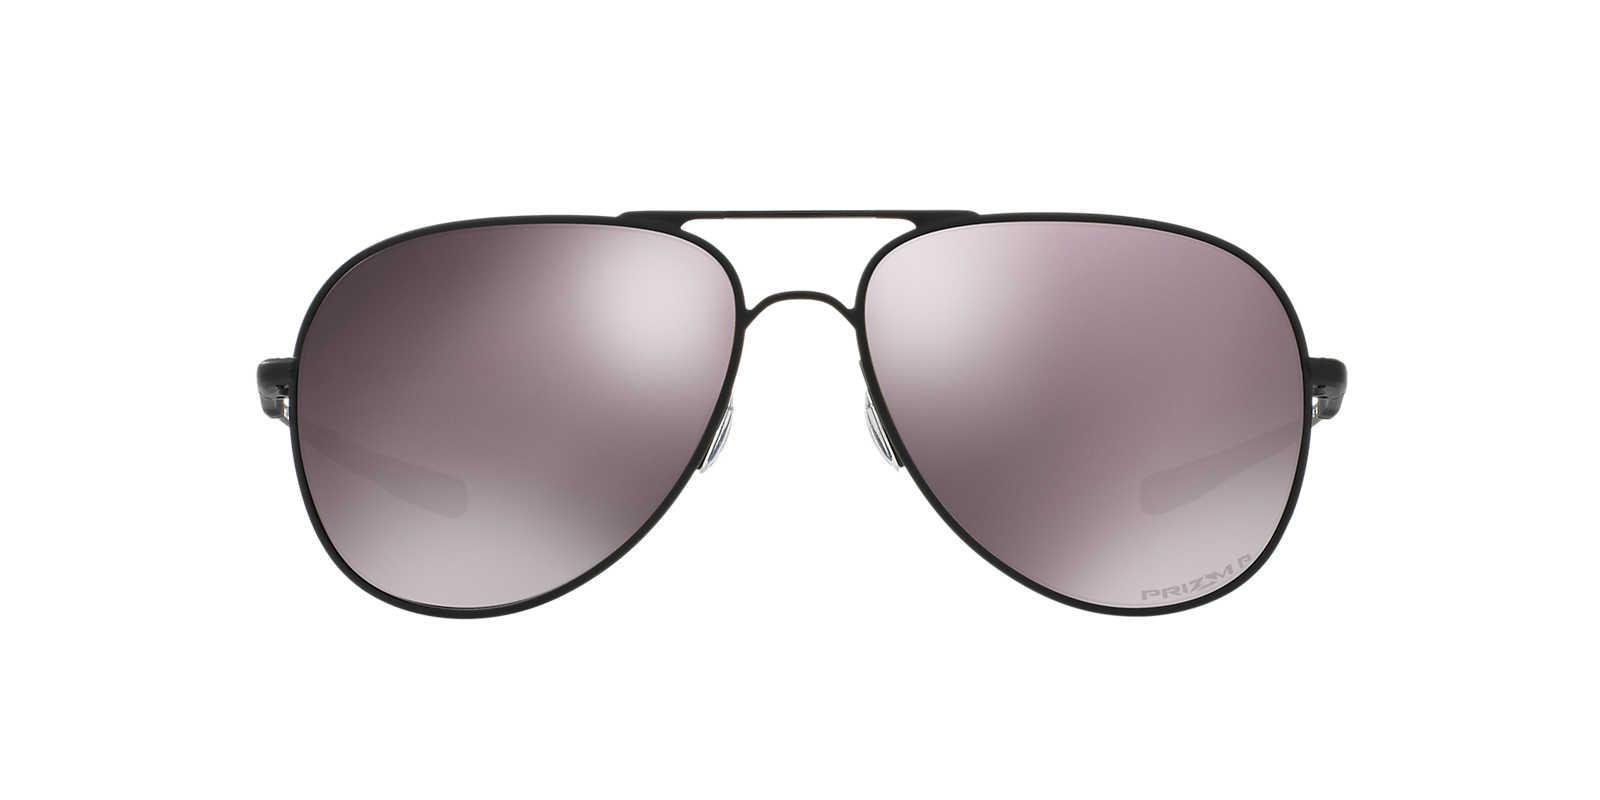 ad03c88f6d Oakley - Black Sunglass Oo4119 60 Elmont M   L Prizm for Men - Lyst. View  fullscreen